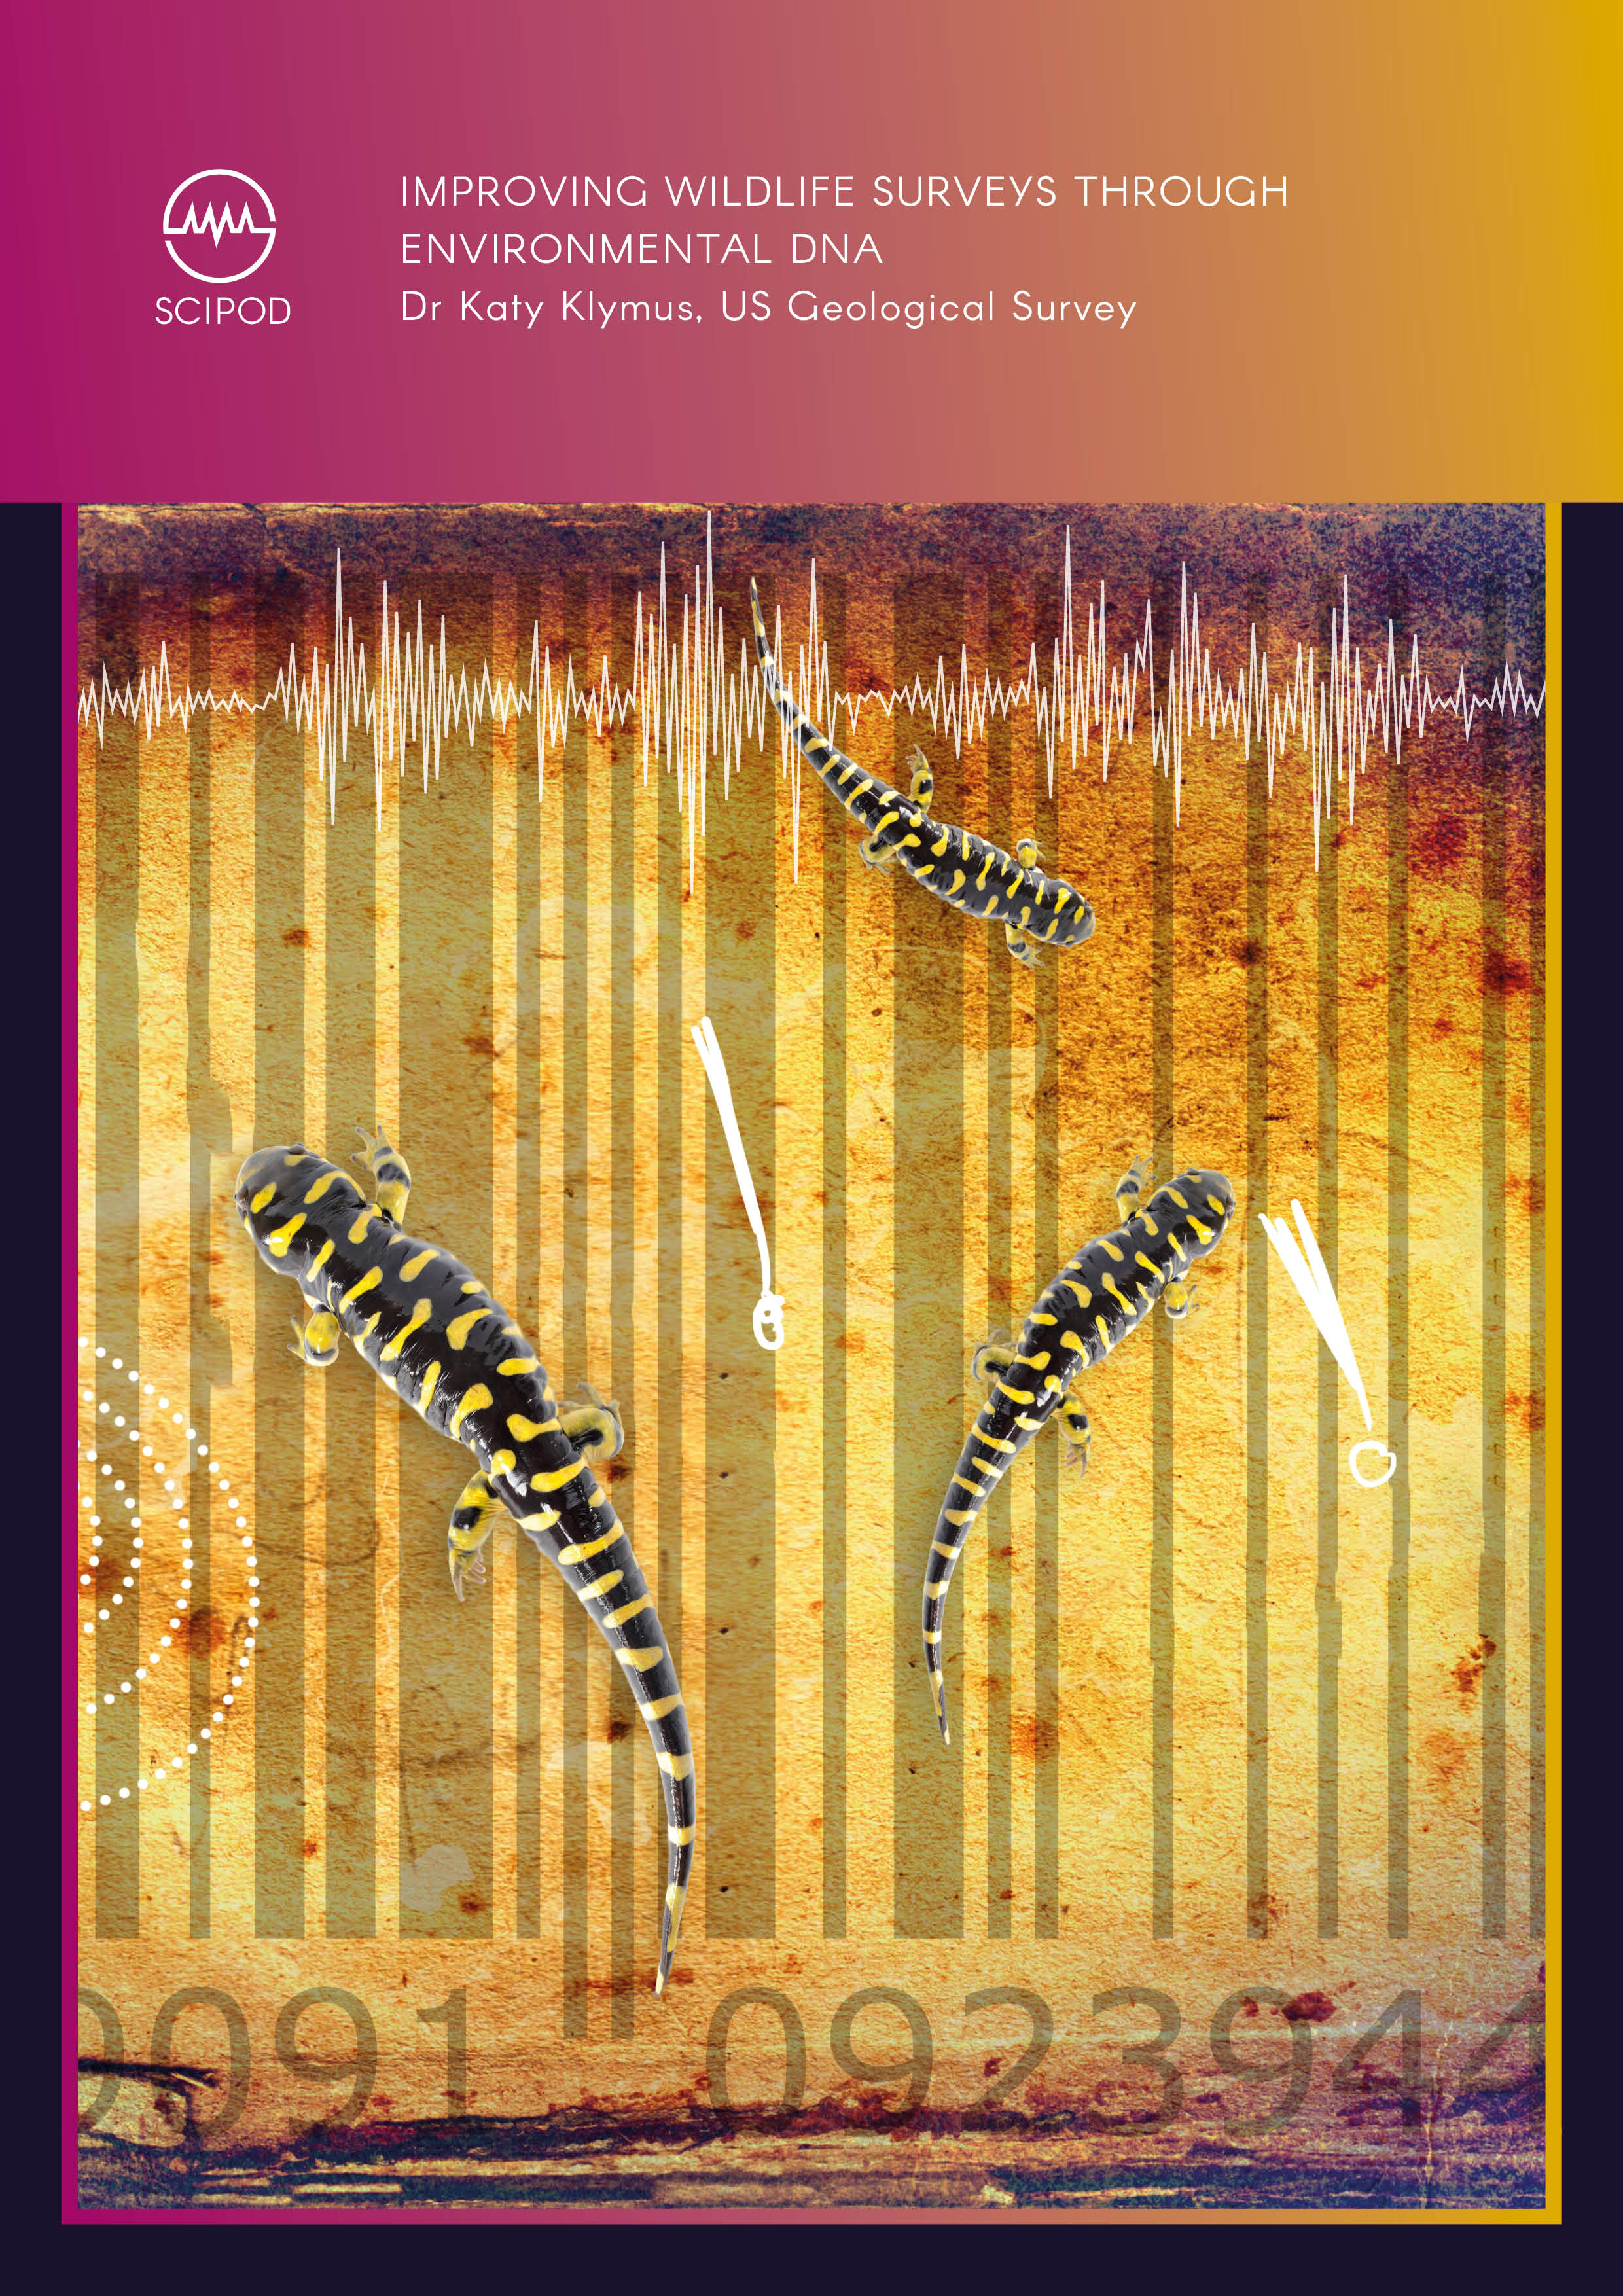 Improving Wildlife Surveys Through Environmental DNA – Dr Katy Klymus